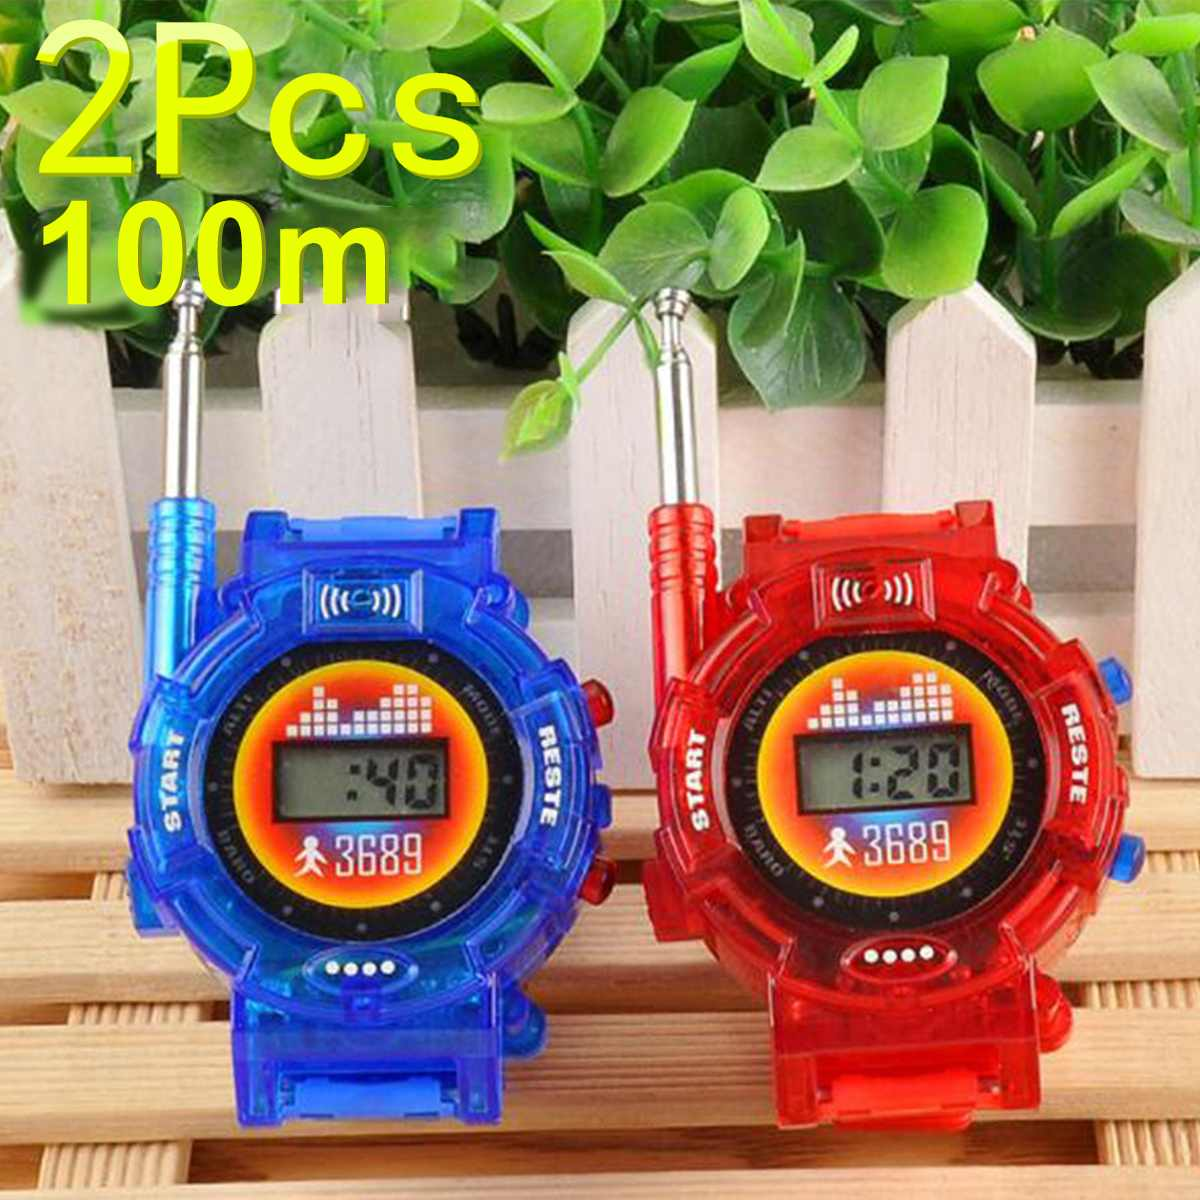 2Pcs Walkie Talkies 10KM Communication Distance Watch Child Kids Watches Two-way Radios Interphone Clock Gift